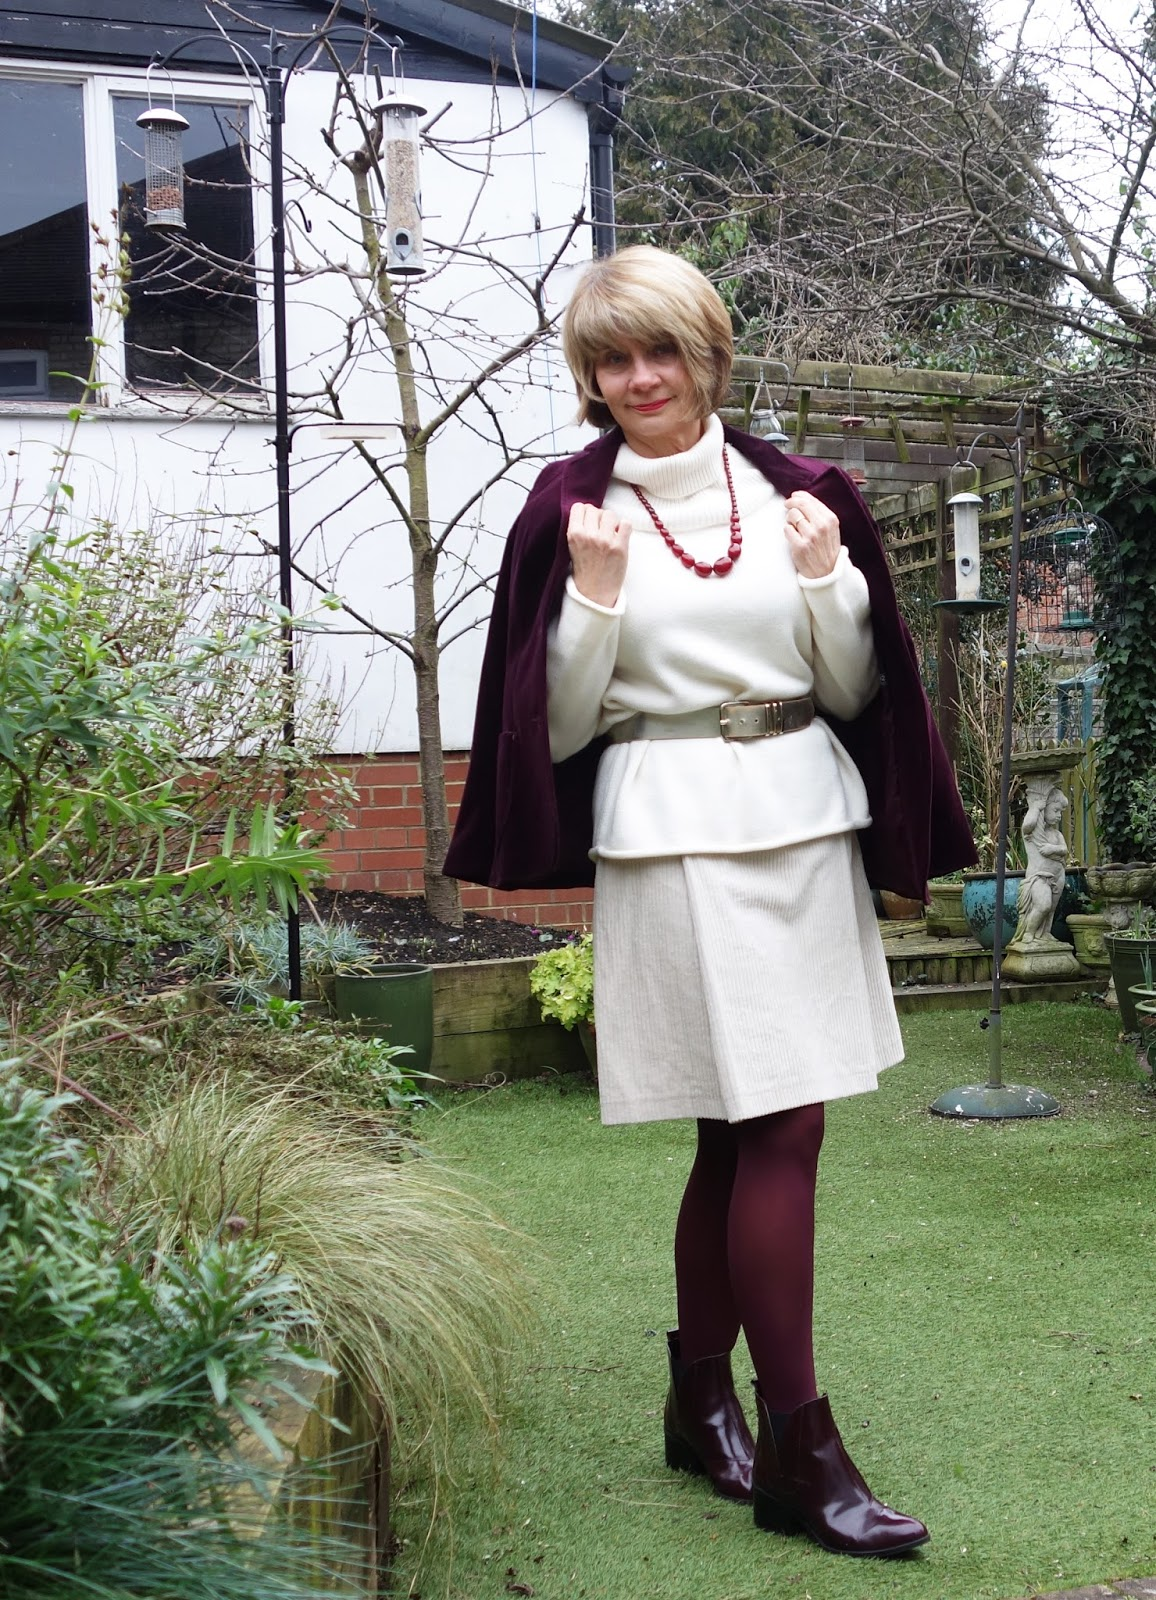 Burgundy velvet jacket worn with cream skirt and jumper and burgundy accessories